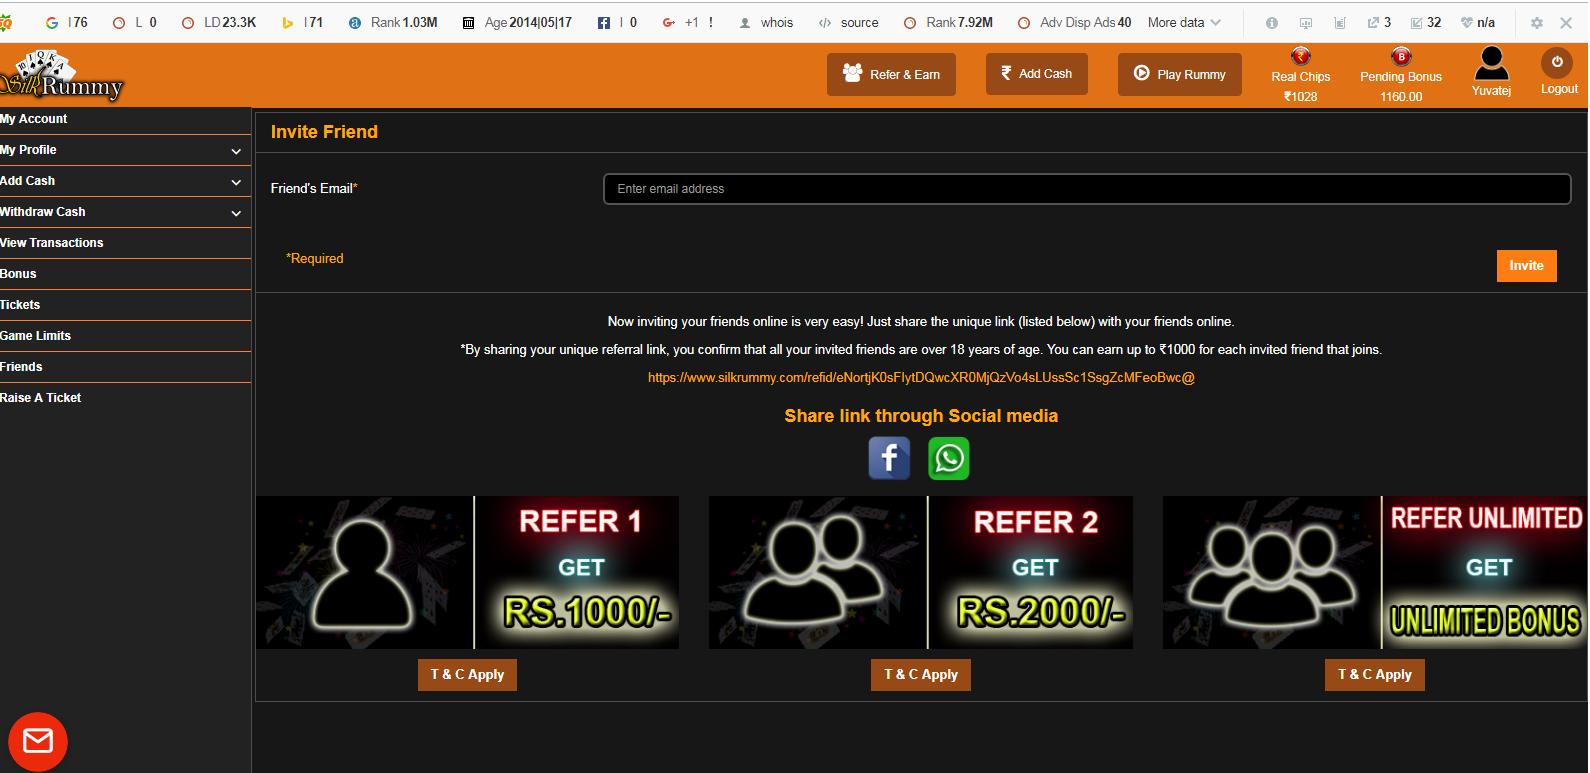 Rummy Refer-a-friend on desktop and get Rs.5000 Cash Bonus- silkrummy